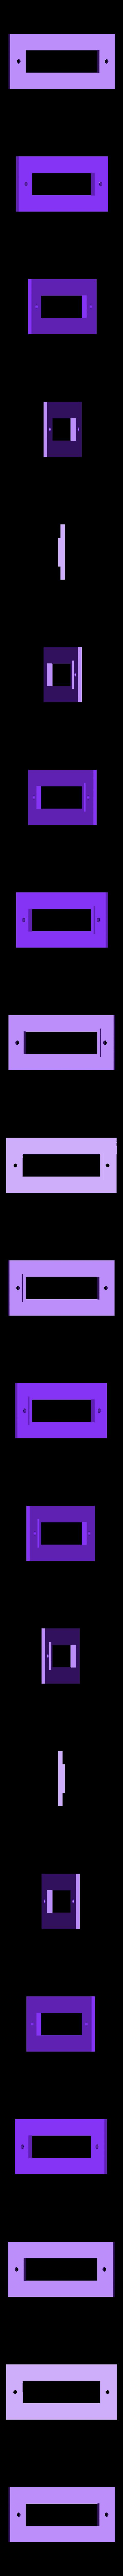 Fingerboard_Planter_TOP_-_design_contest_submission_Baschz_Leeft.stl Download free STL file Modular Fingerboard Ramp & Planter • Object to 3D print, baschz